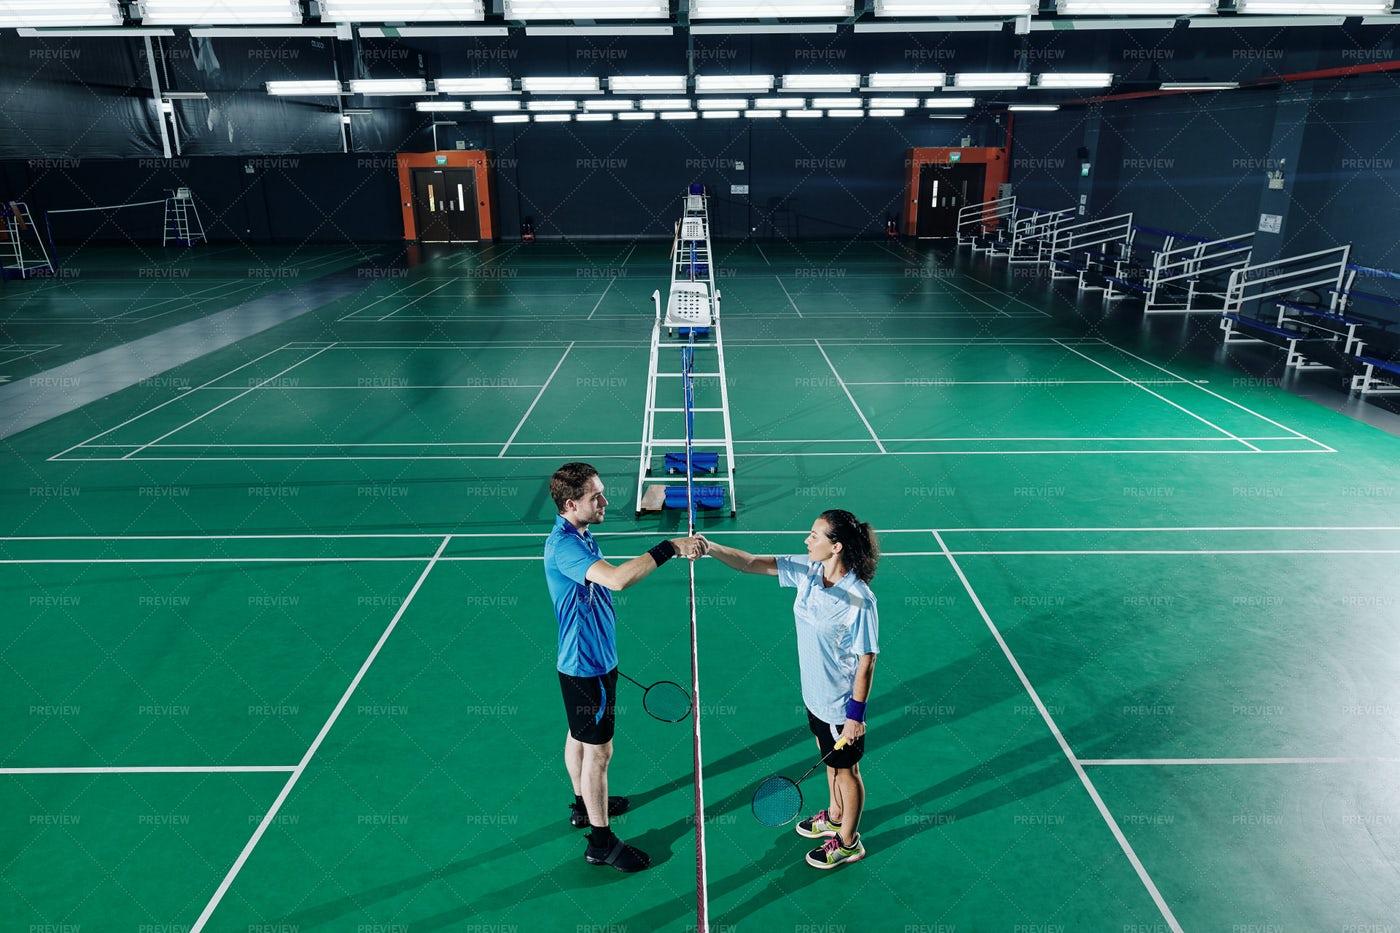 Badminton Players Training In Gymnasium: Stock Photos